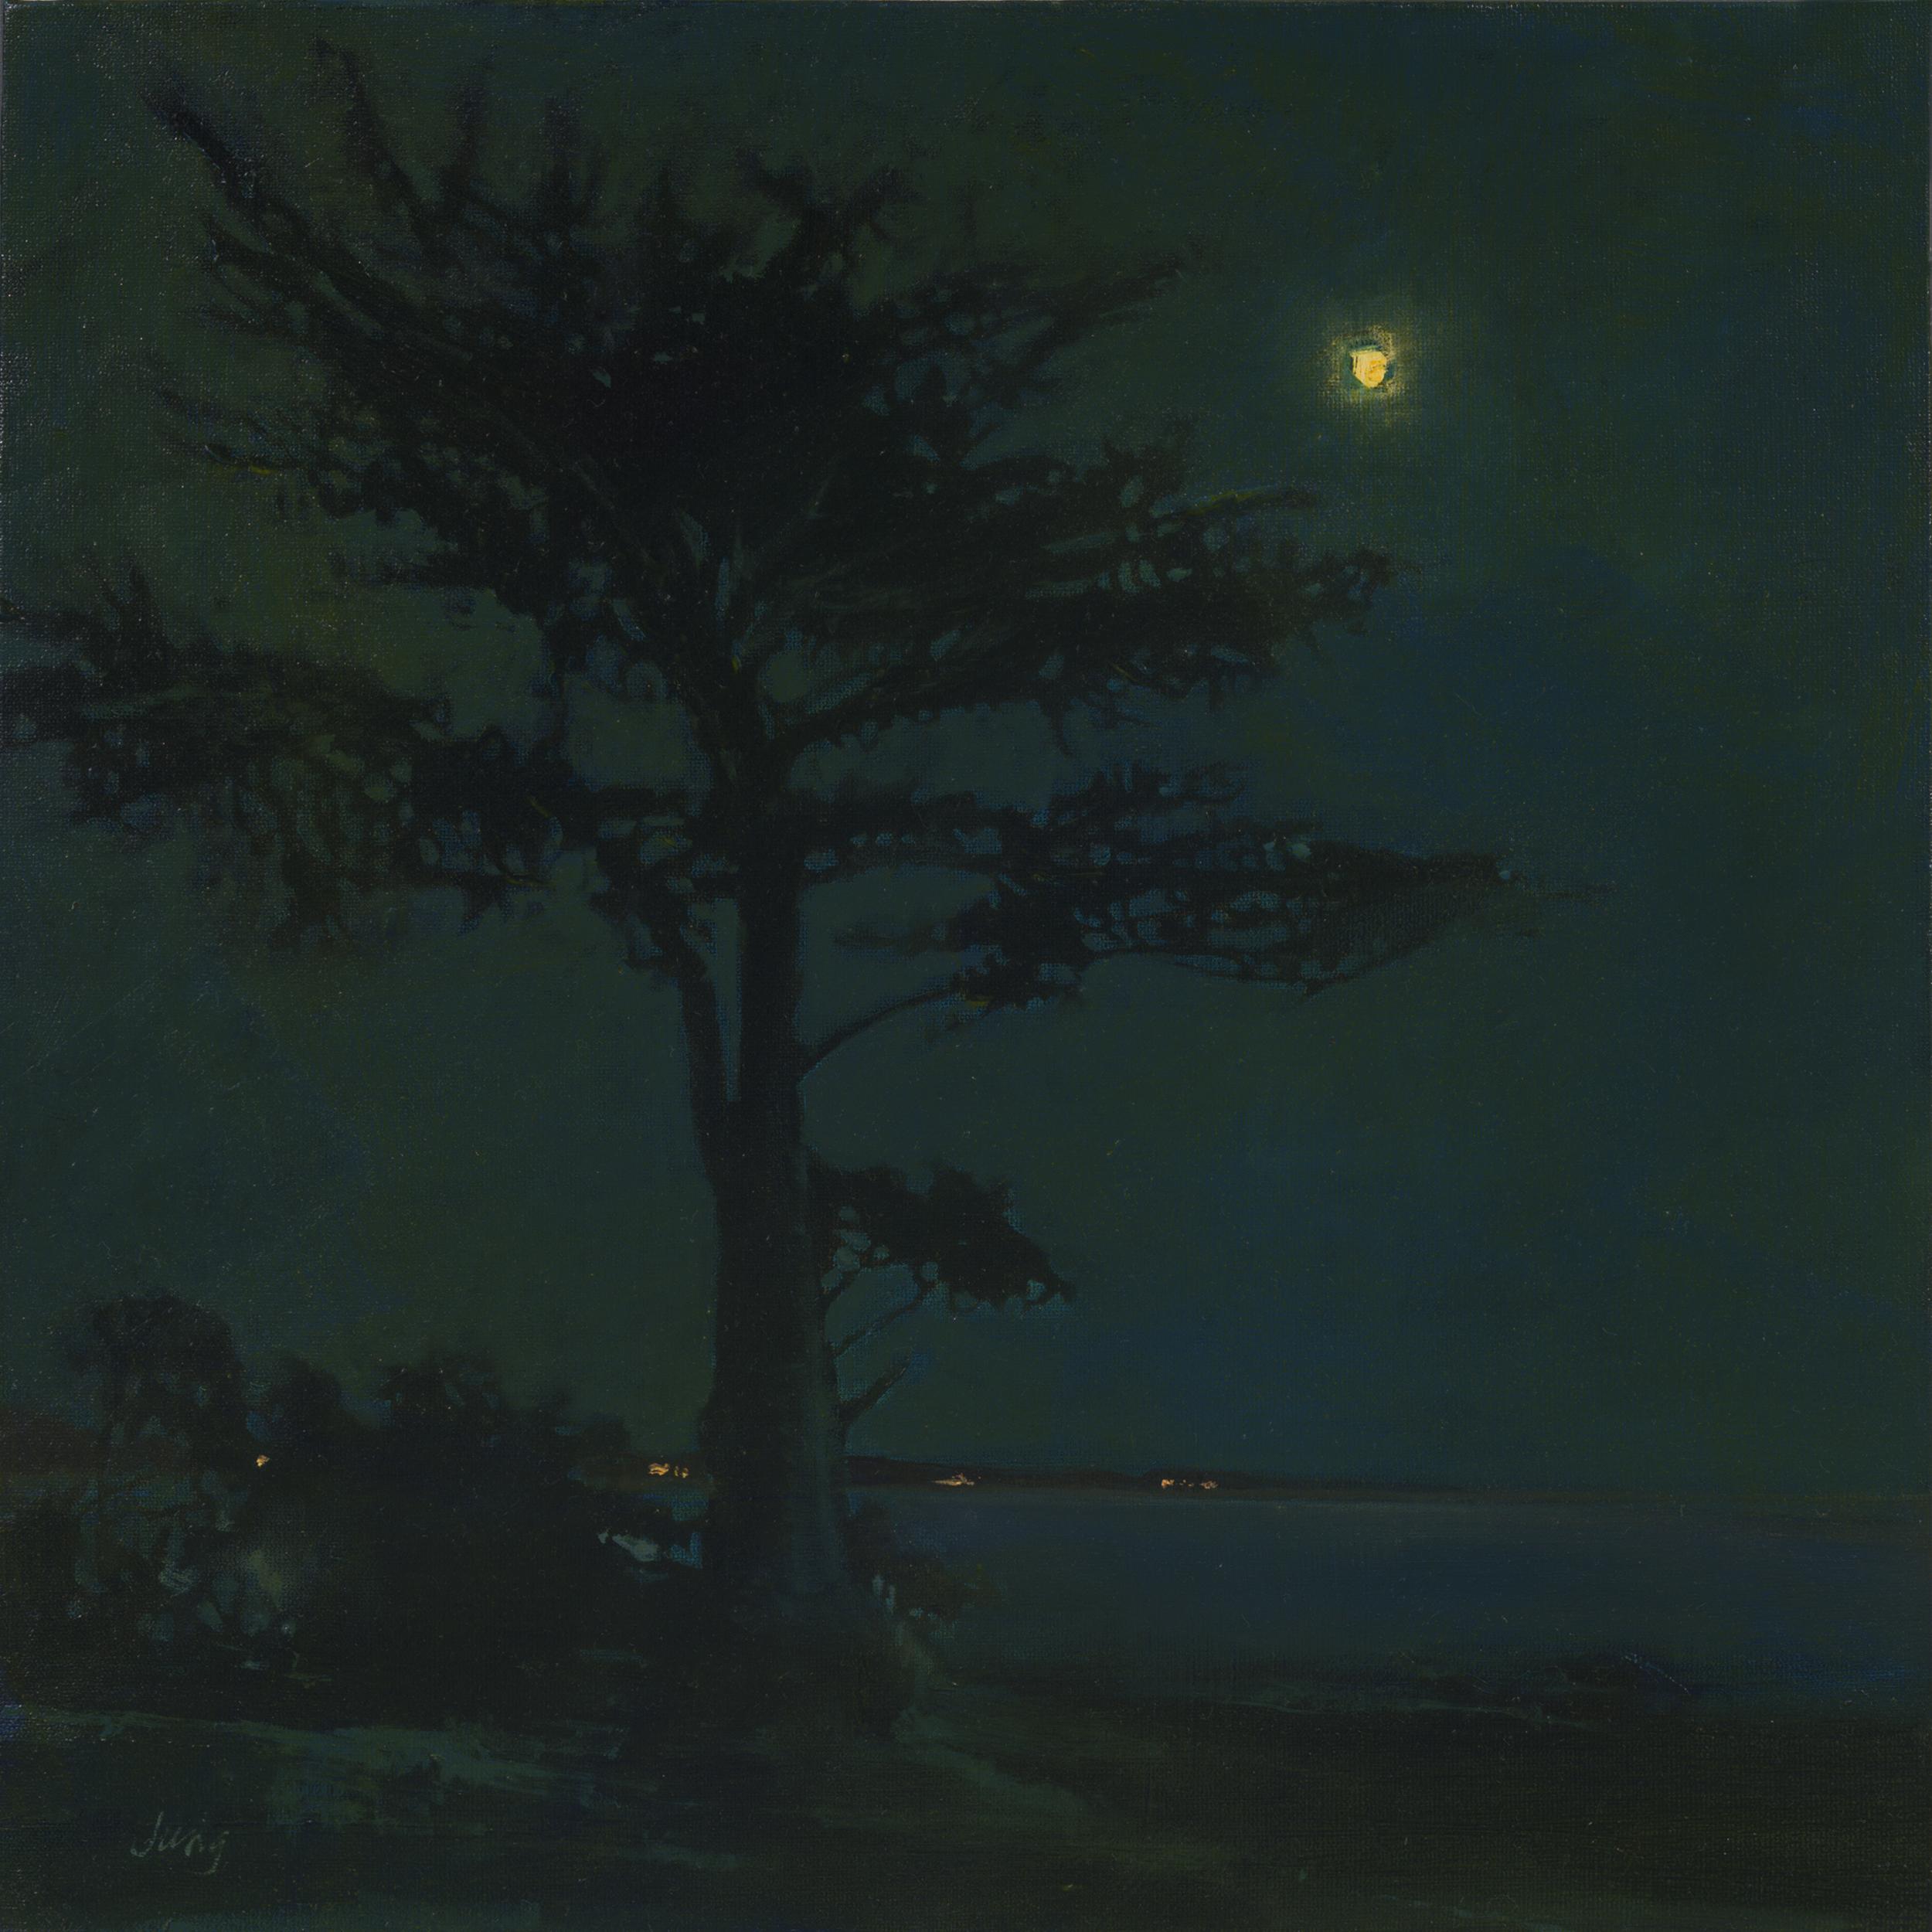 Moonrise Over Steamer's Lane ~ Santa Cruz, CA